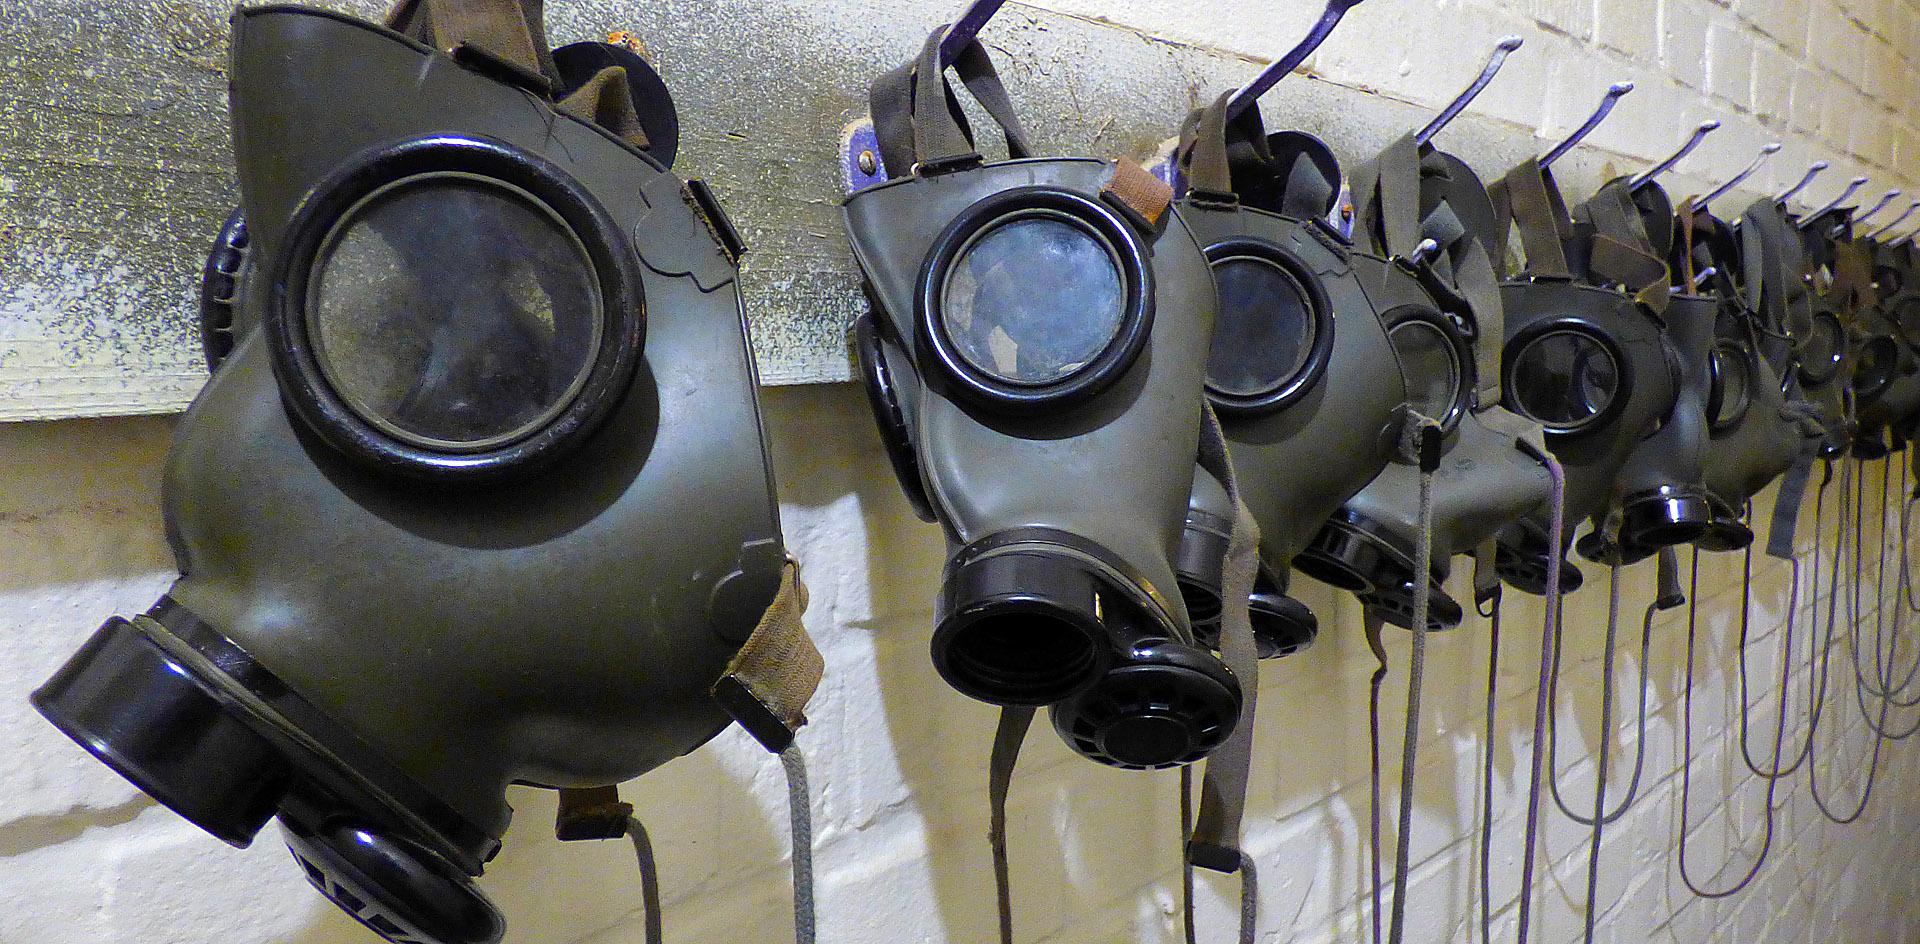 МВД и Росгвардия закупают противогазы от коронавируса